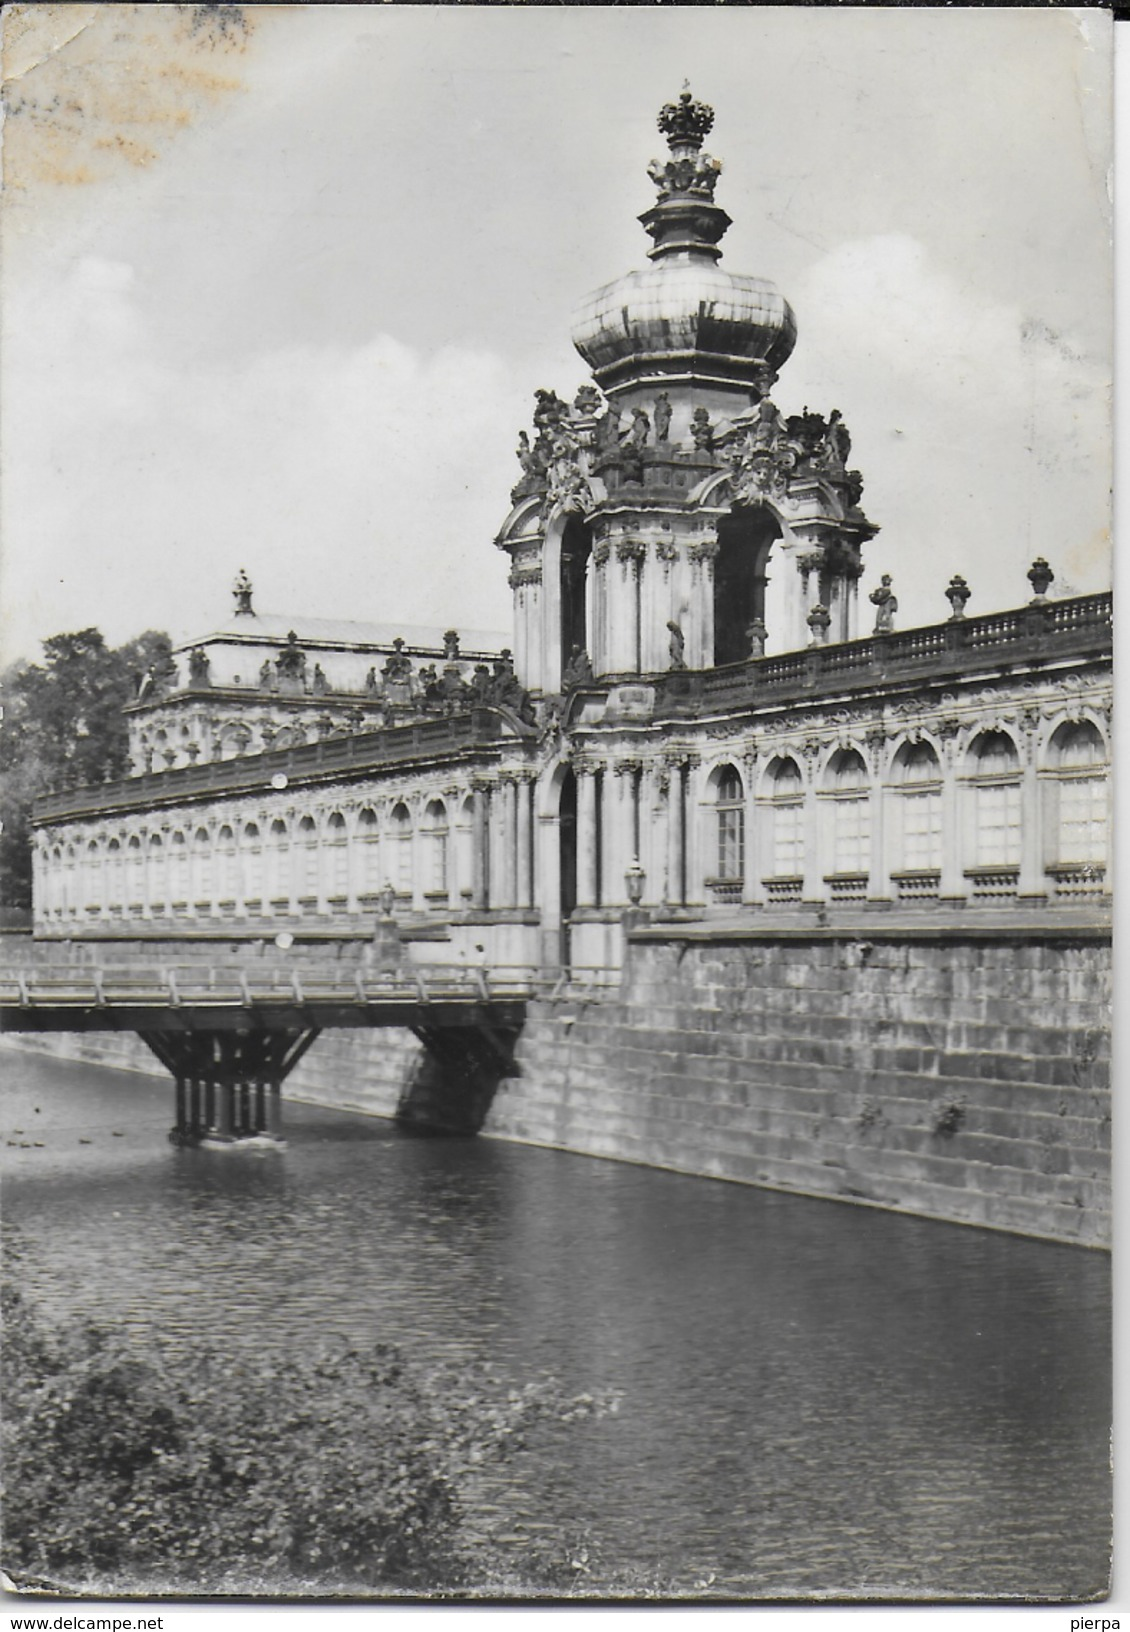 GERMANIA - DRESDA - ZWINGER - VIAGGIATA 1980 - AFFRANCATURA D.D.R. NON TIMBRATA - Dresden